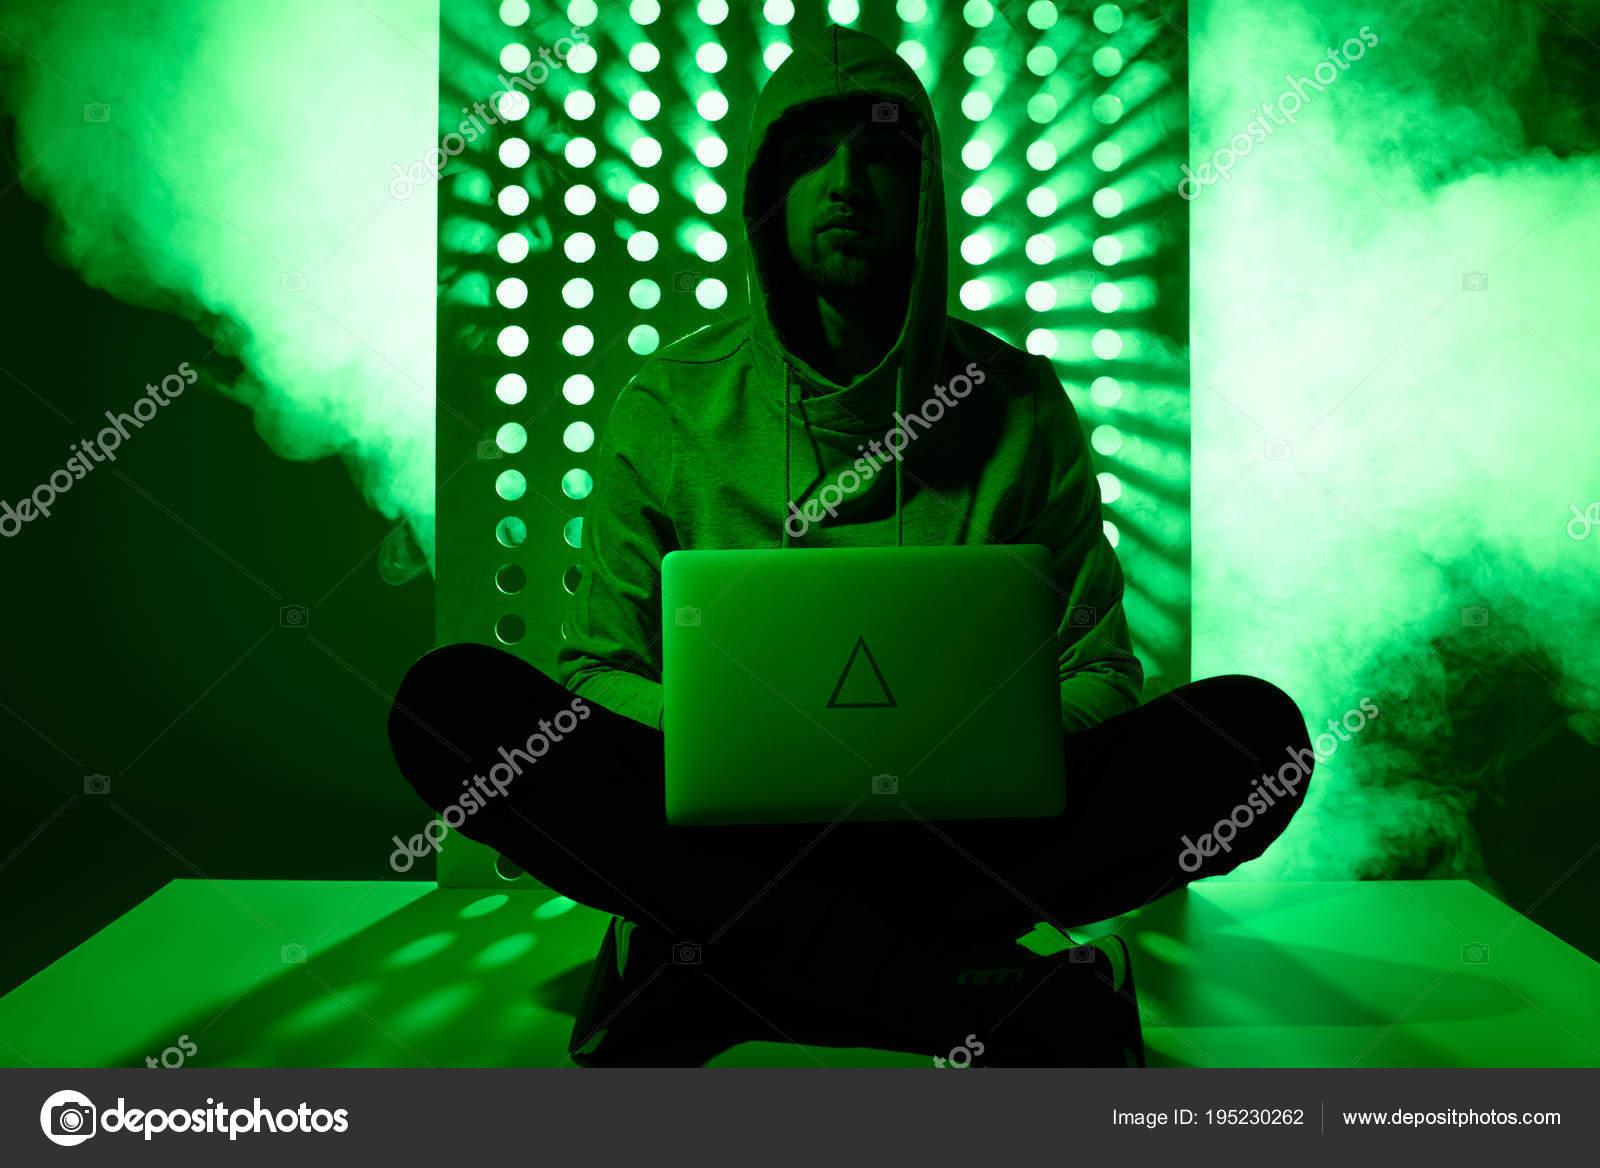 be209a99b6 Πιο Ήπια Εικόνα Του Χάκερ Στο Hoodie Φορητό Υπολογιστή Και — Φωτογραφία  Αρχείου